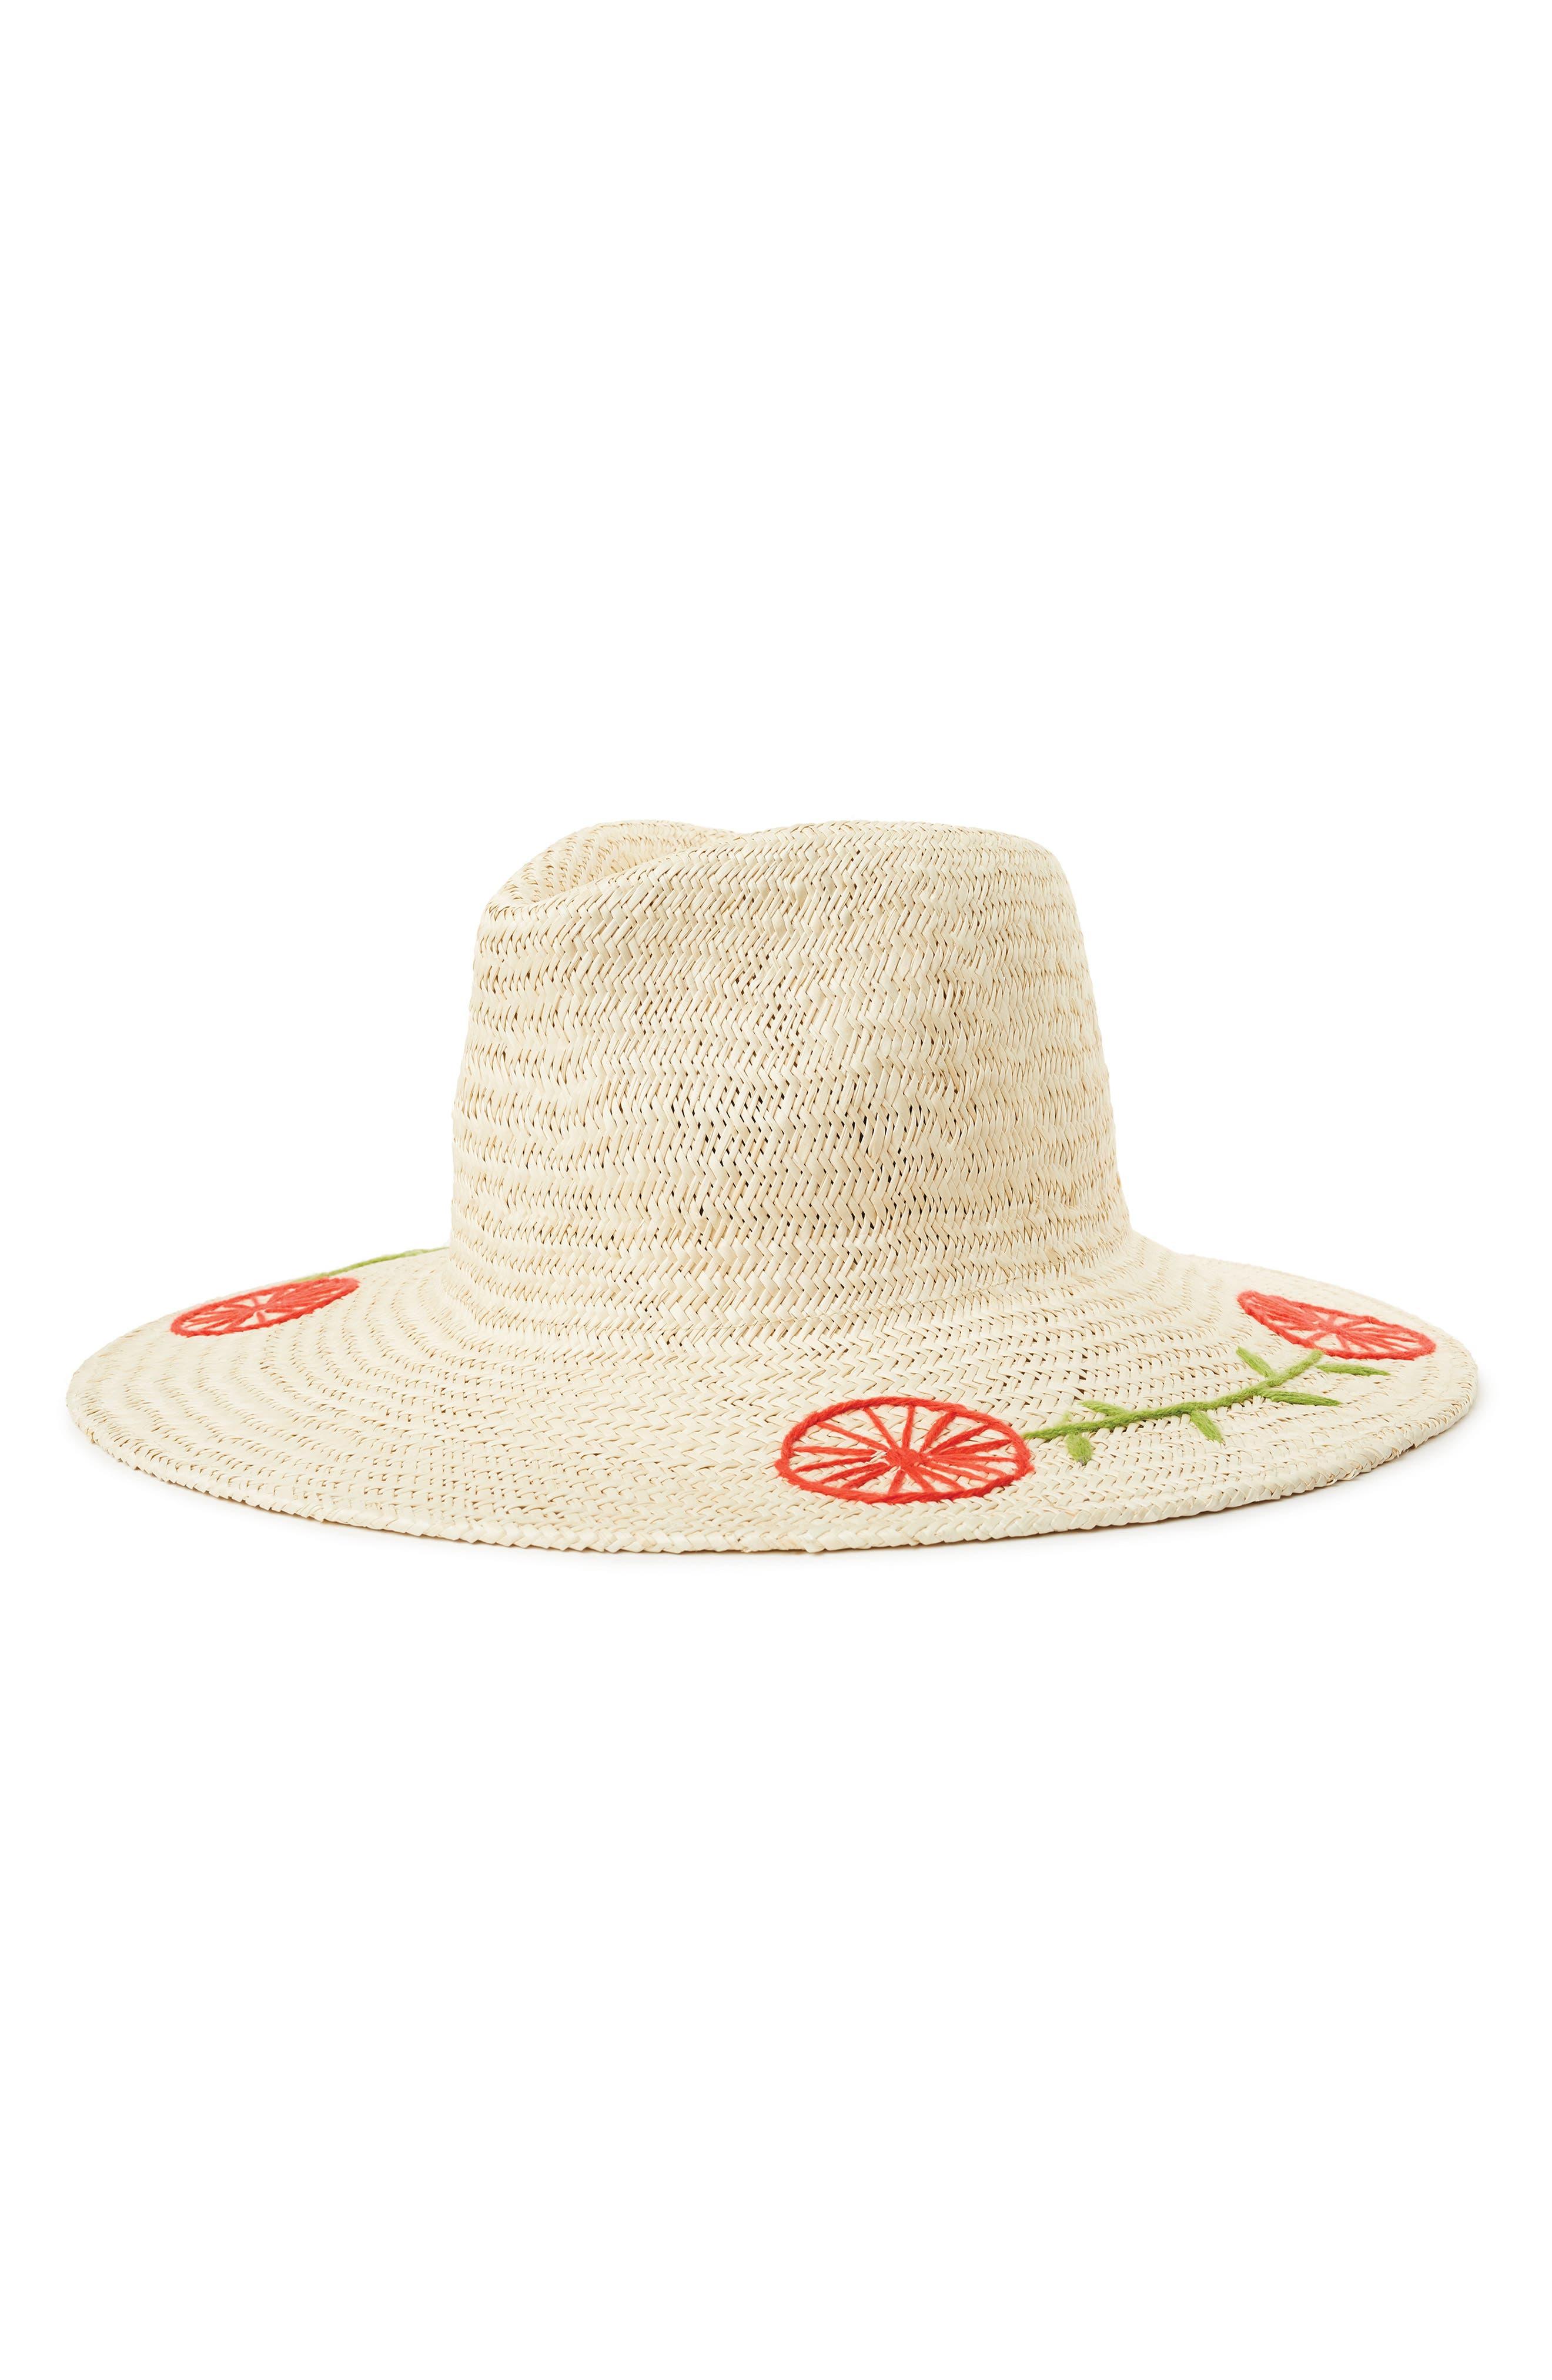 9a1077ff65da0 Beige Brixton Hats for Women